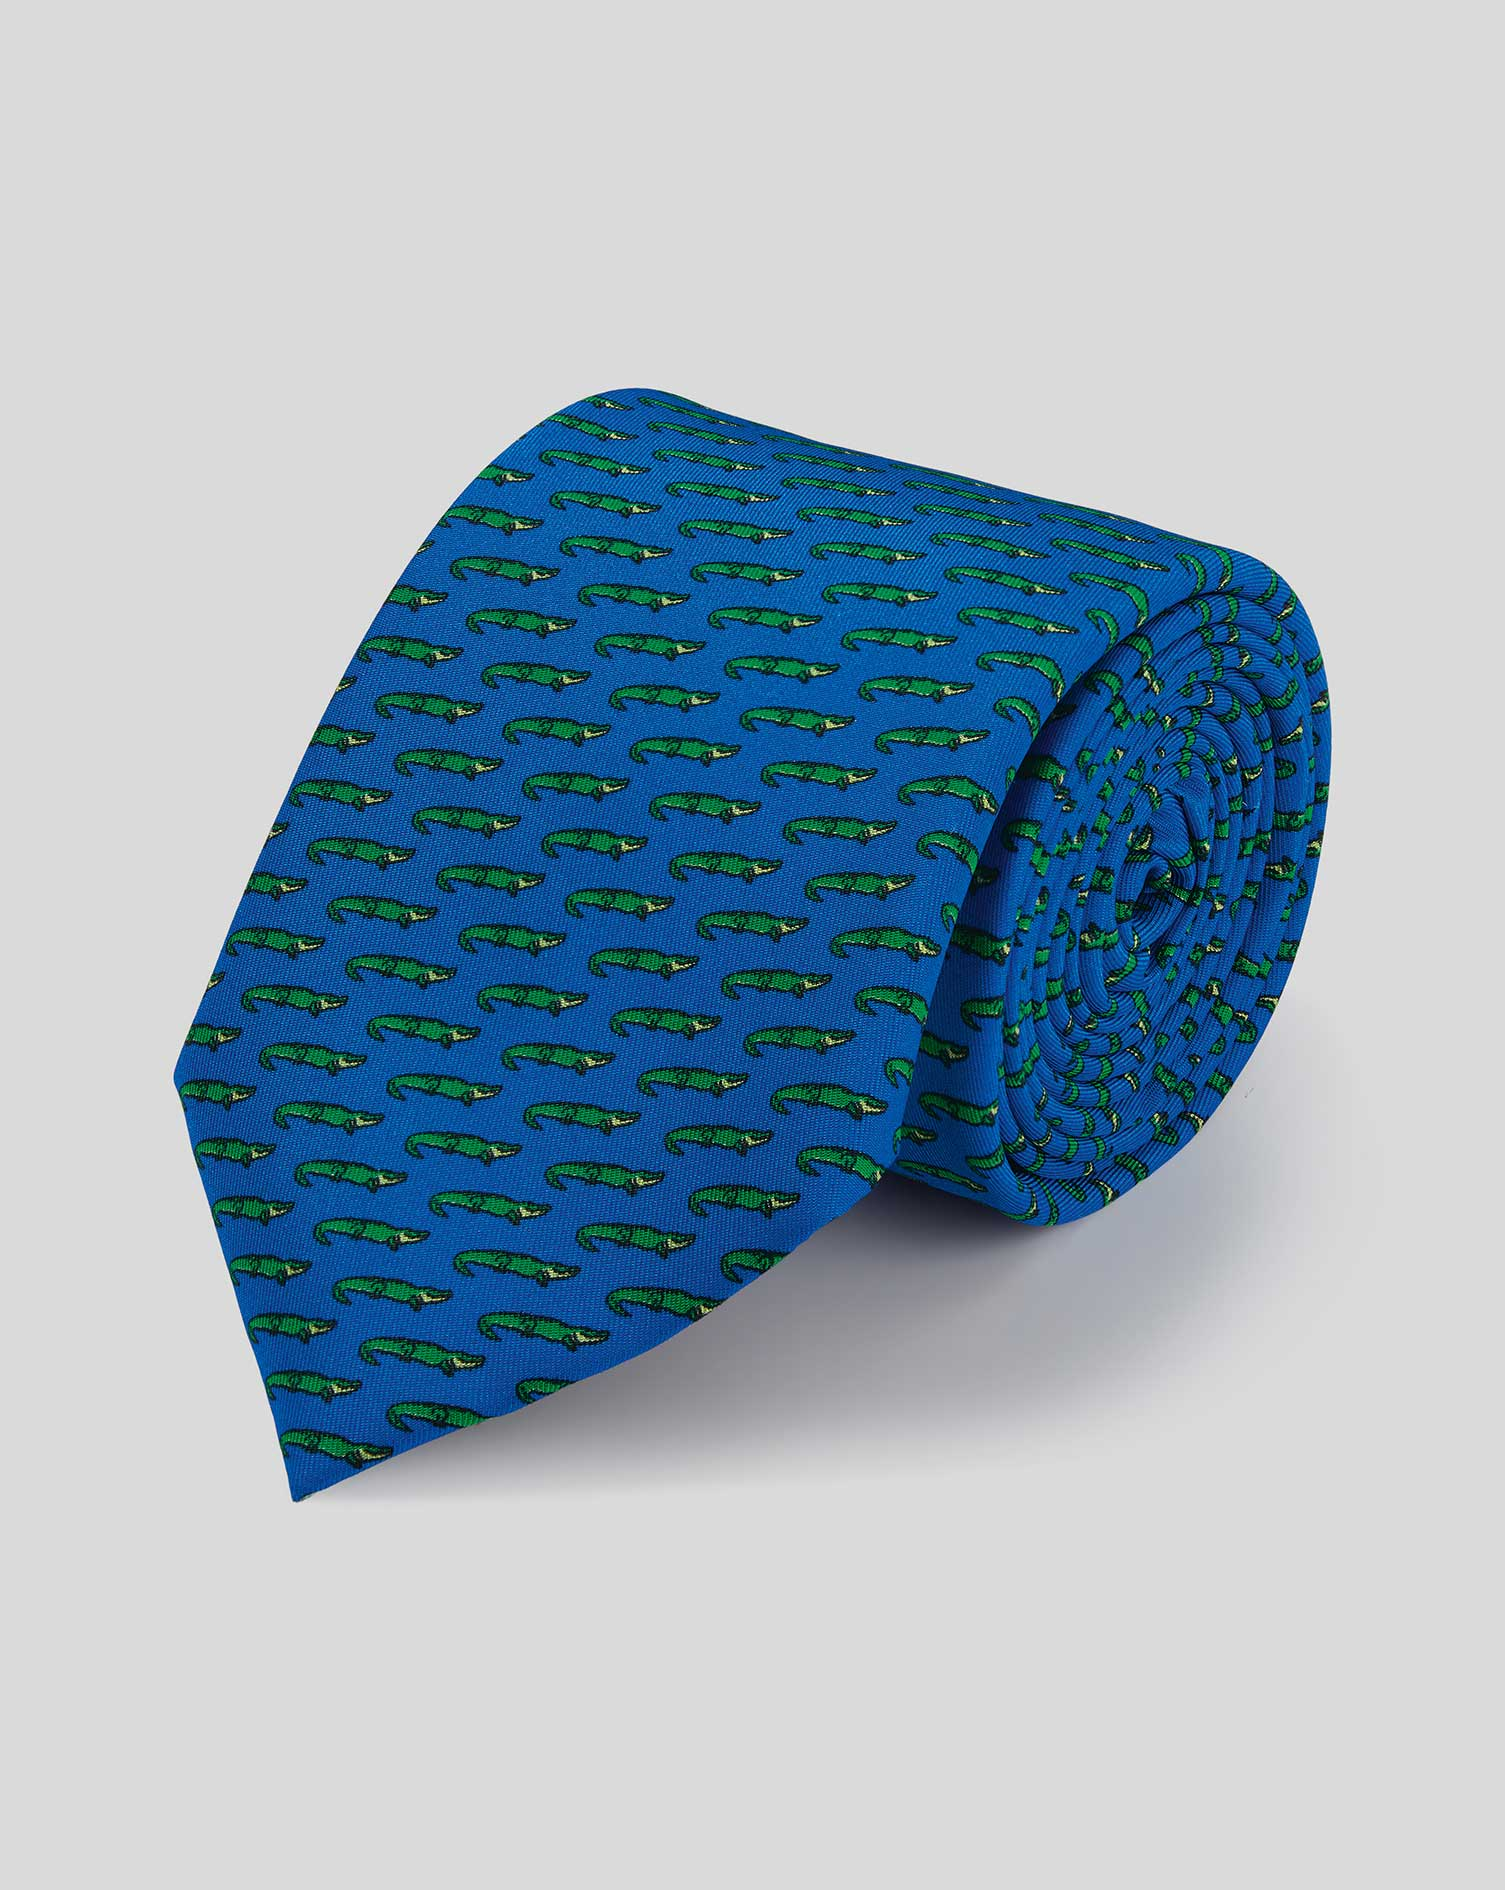 Image of Charles Tyrwhitt Alligator Silk Print Classic Tie - Royal Blue & Green by Charles Tyrwhitt